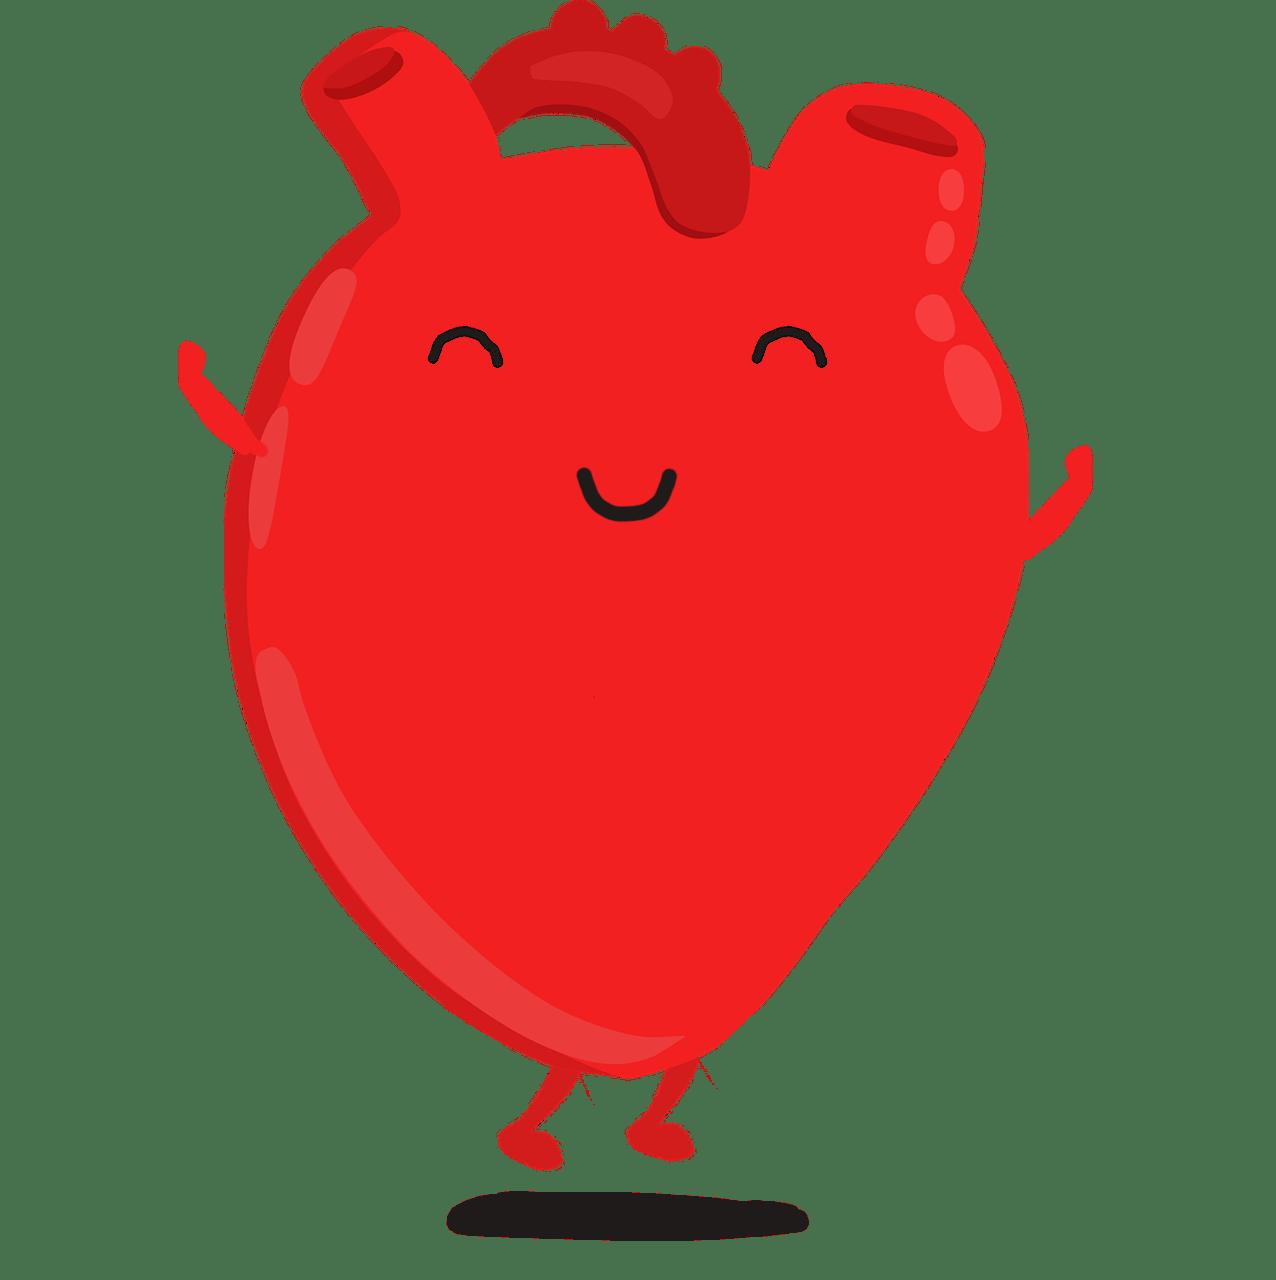 heart 5095487 1280 1